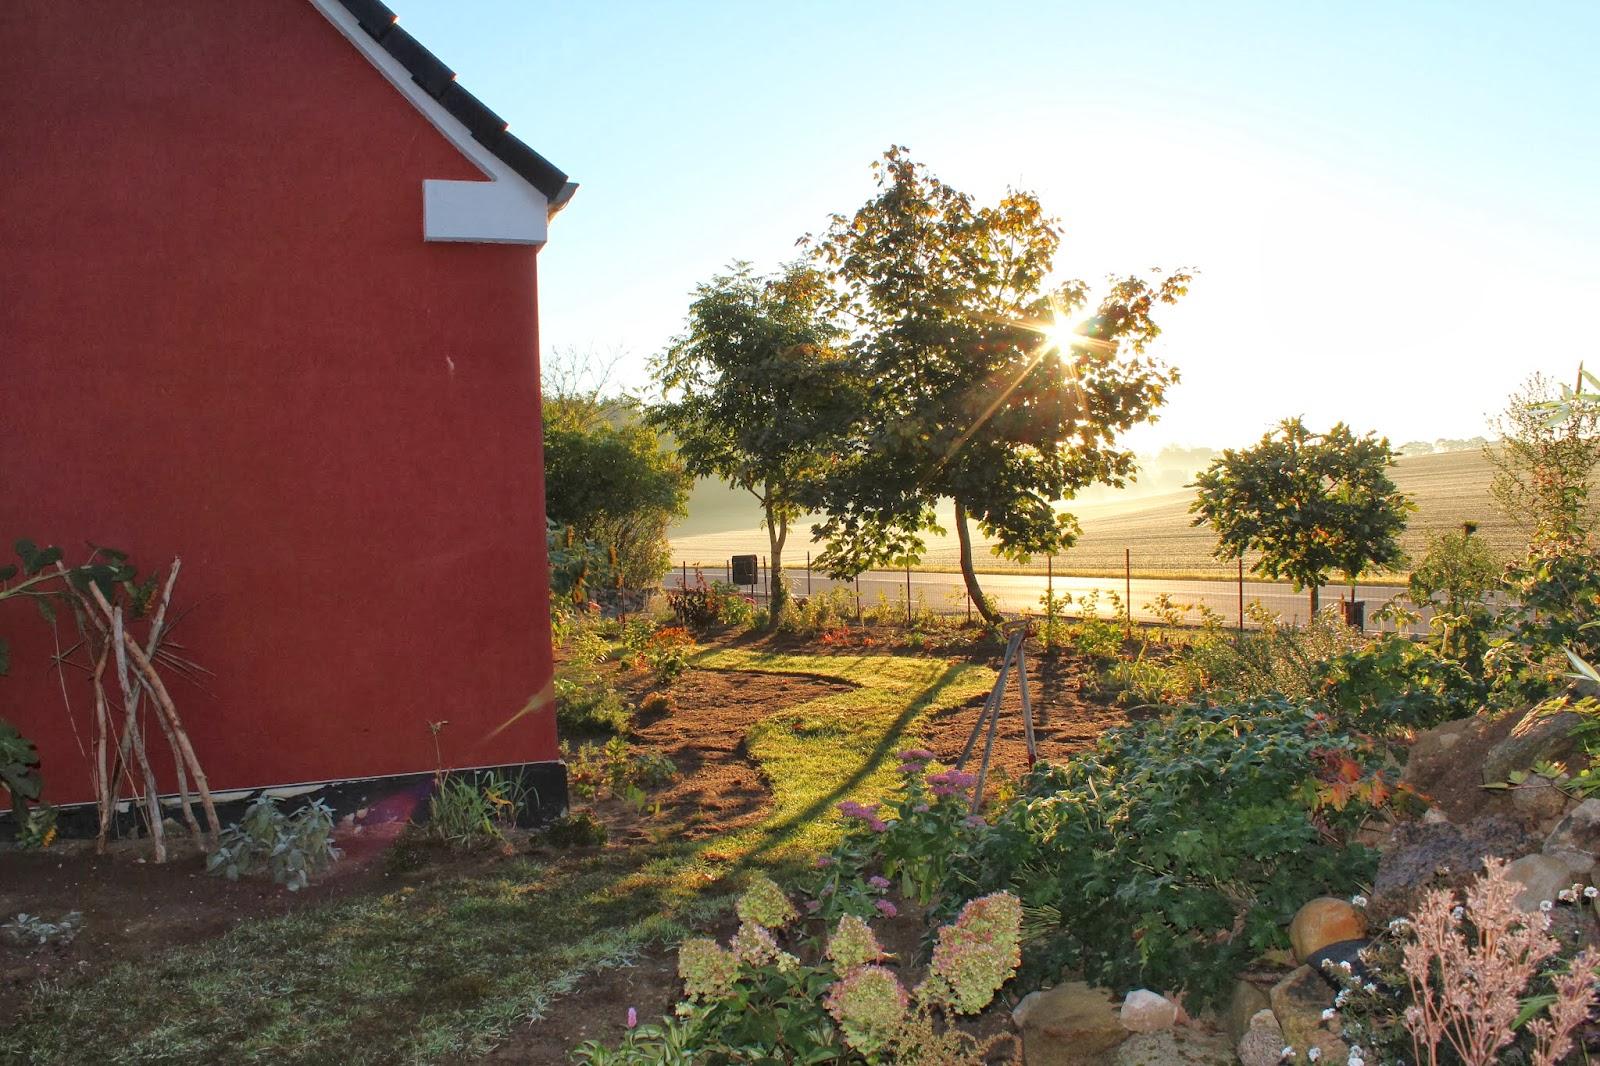 Anettesflora: kaffe i det fri, haveplan og hjerter på rionet